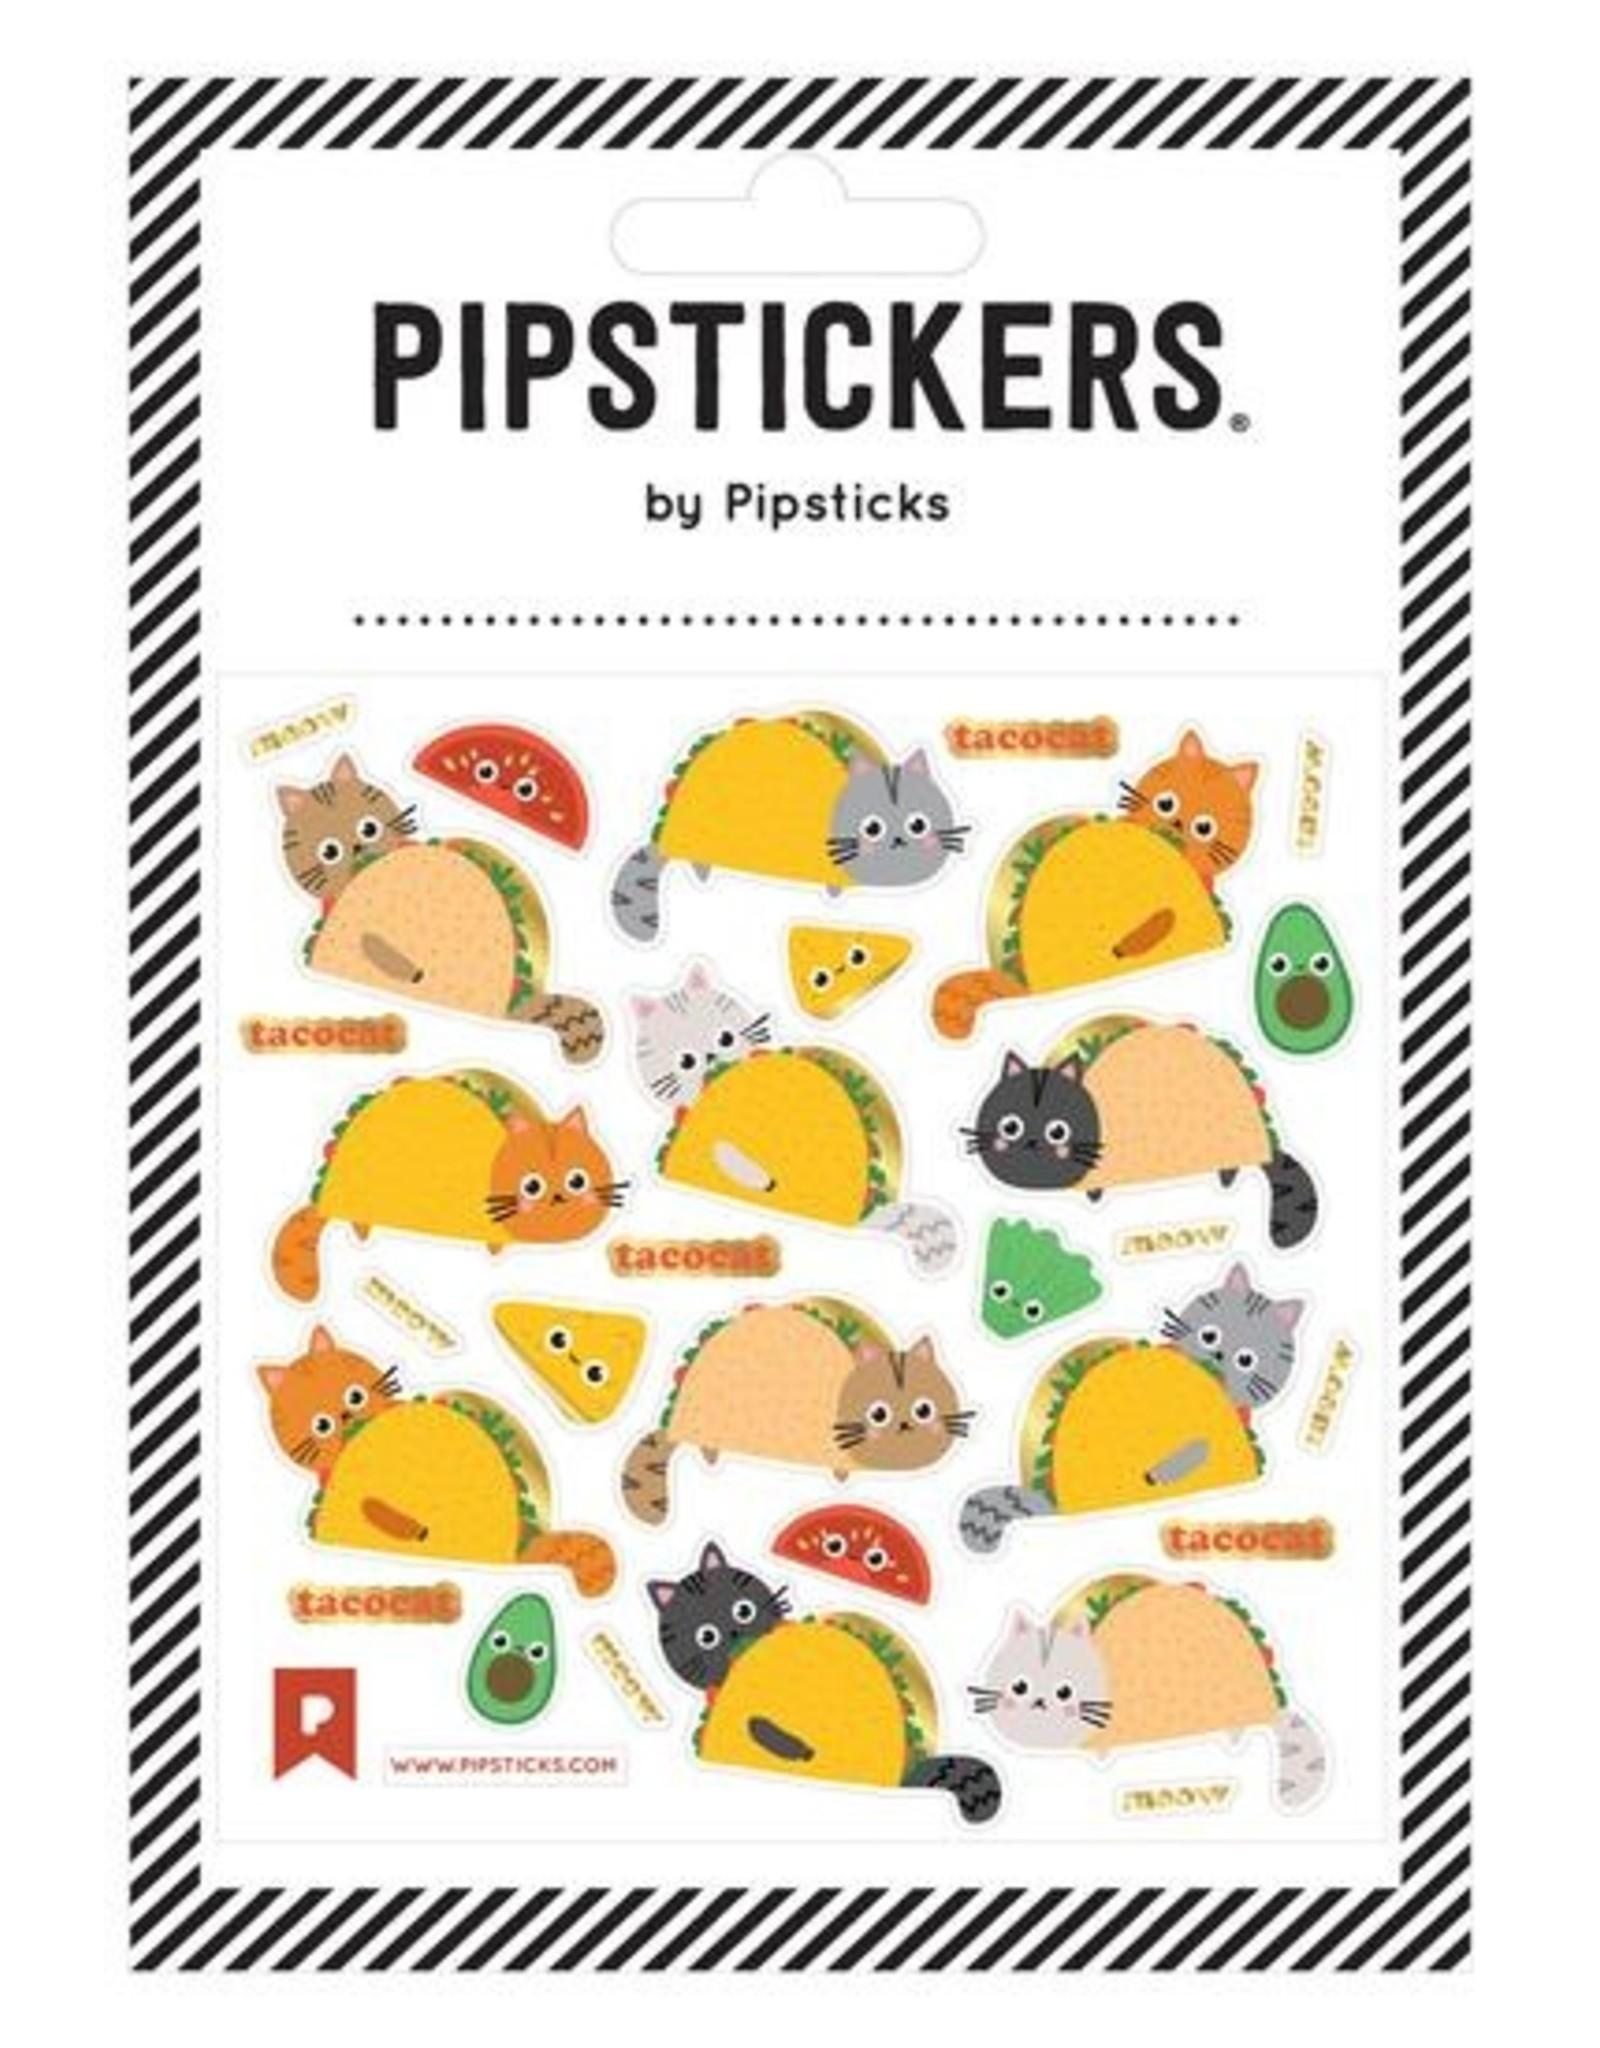 Pipsticks (Square page)